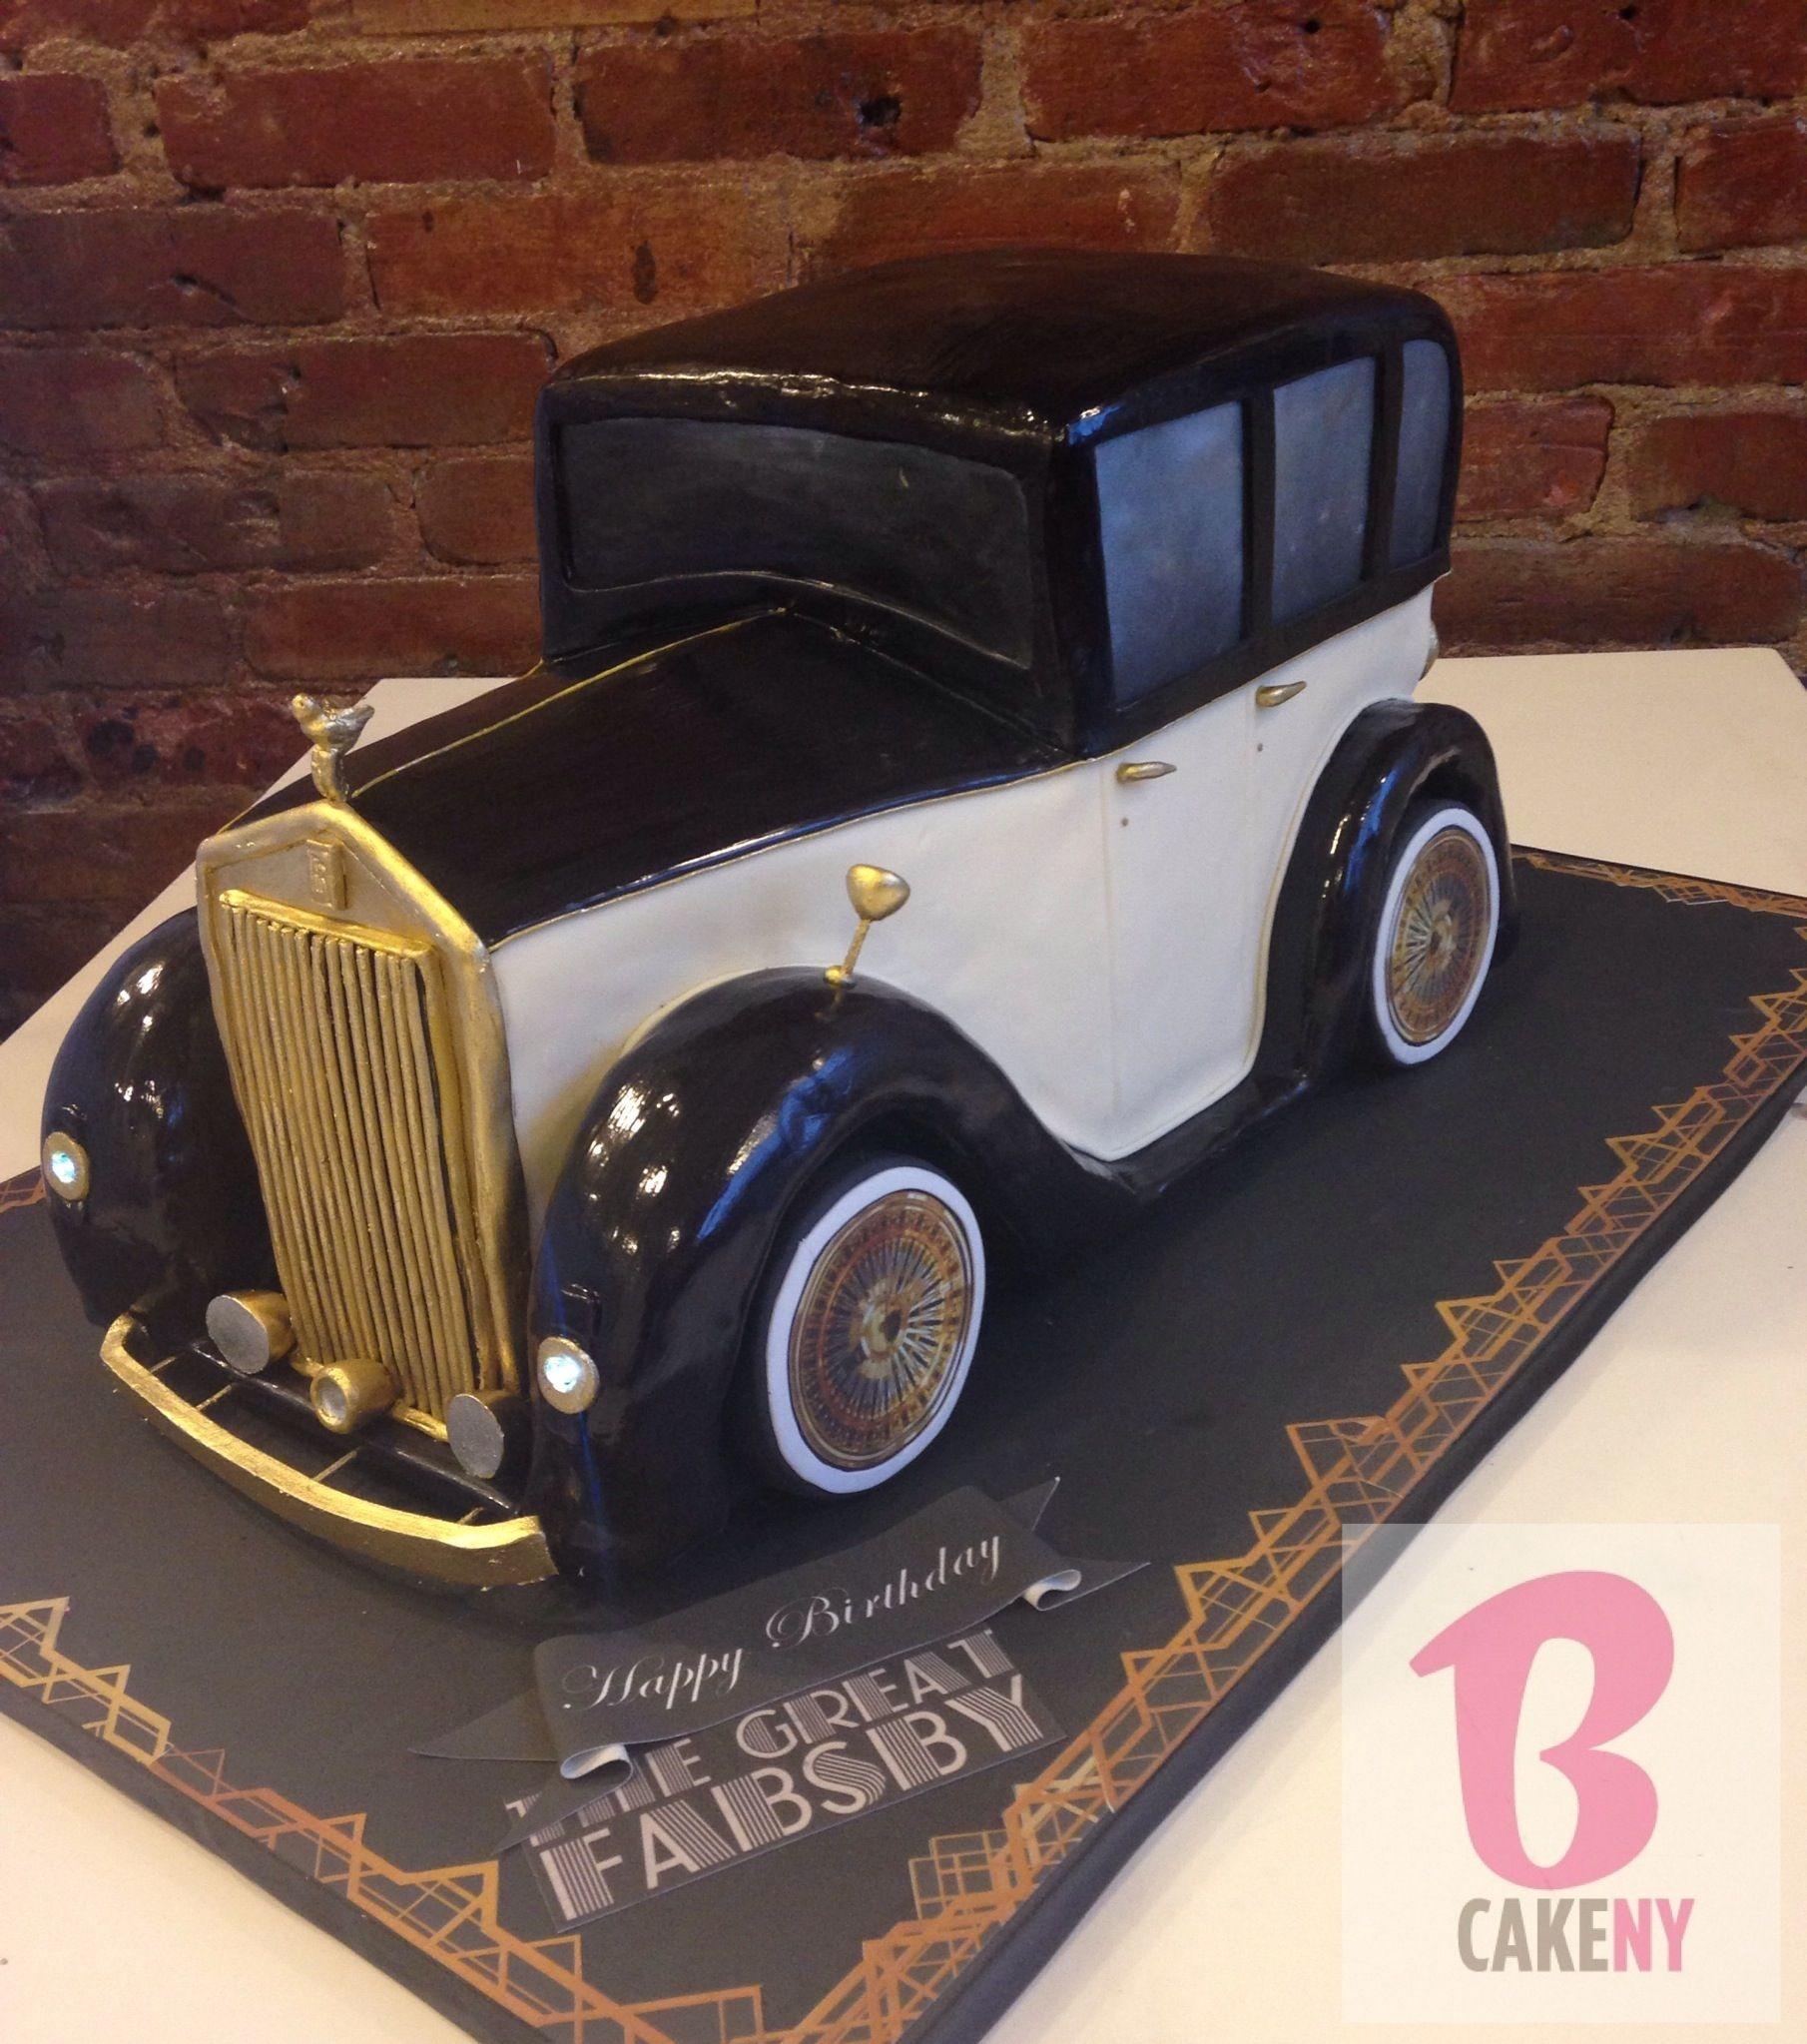 Rolls Royce Cake! | BCakeNY CAKES | Pinterest | Rolls royce, Royce ...